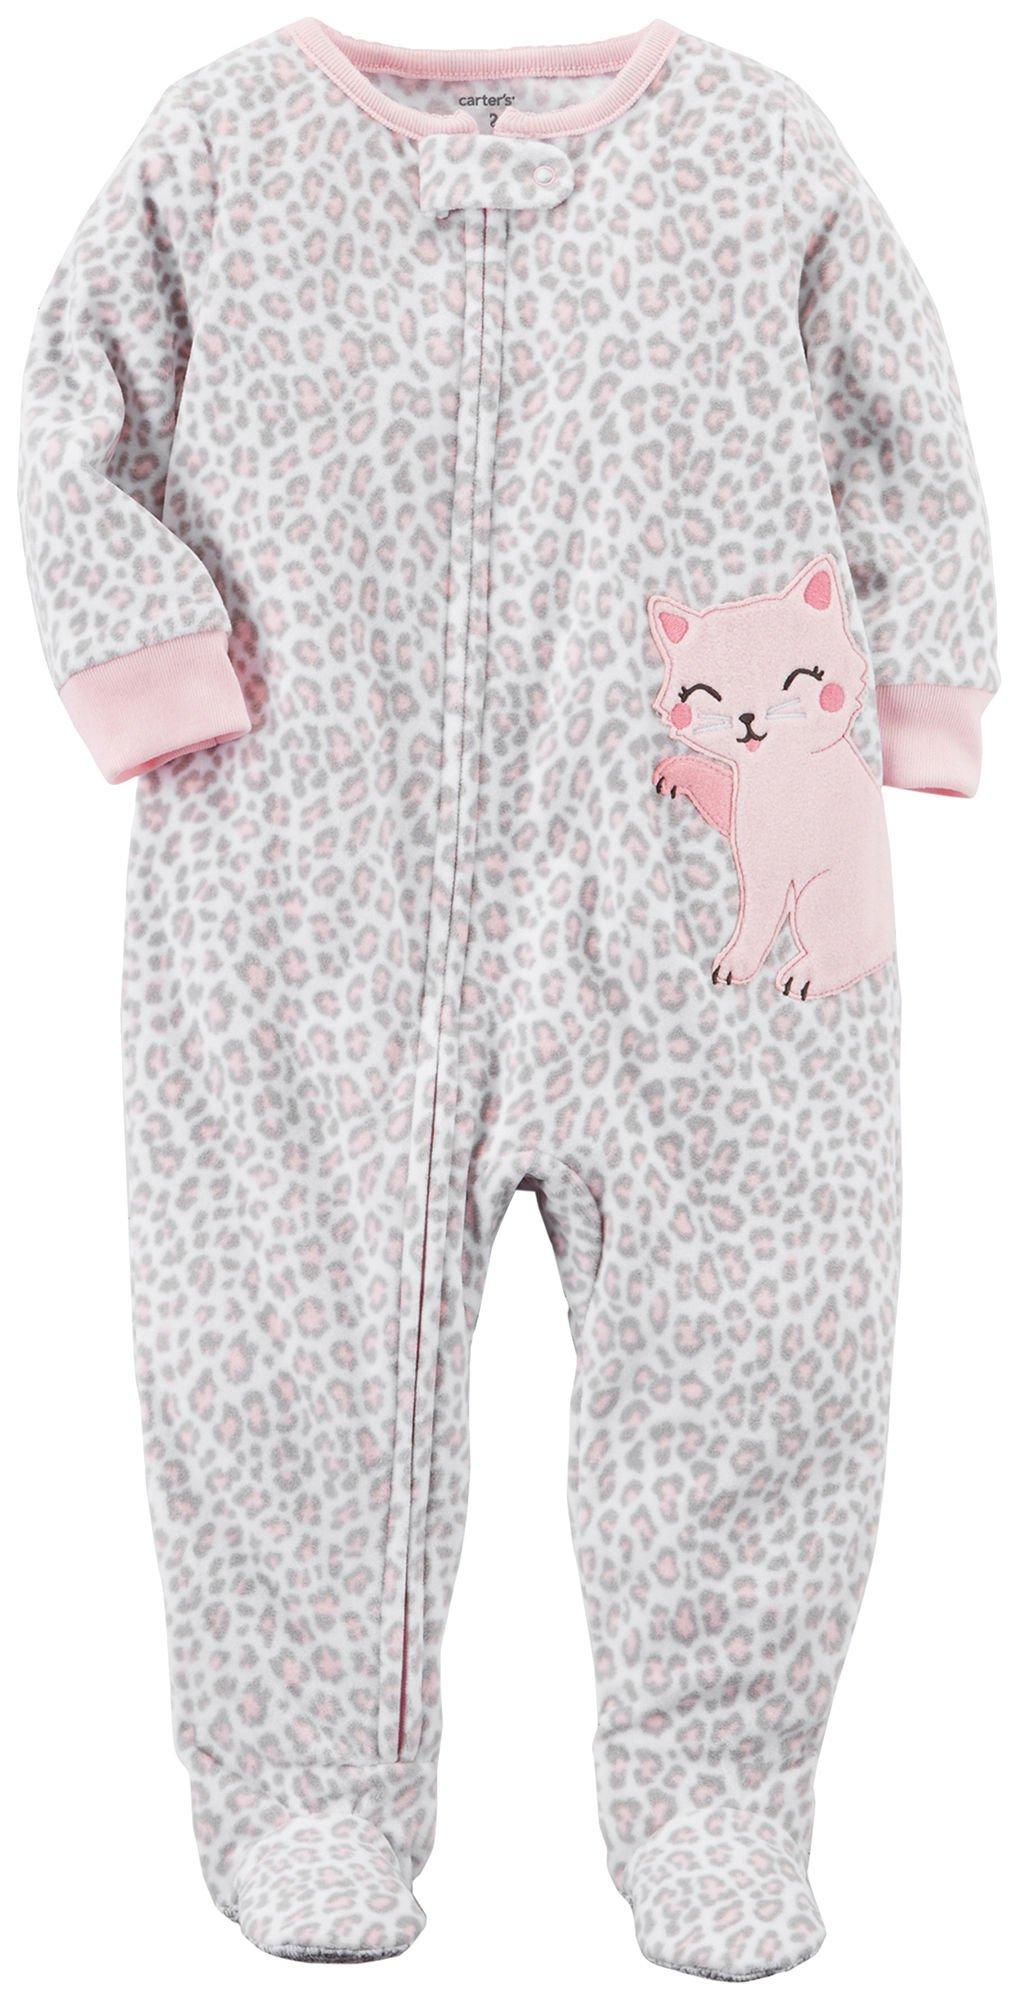 pajamas sleepers zoom pjs sleeper v one baby fleece piece oshkosh loading girl